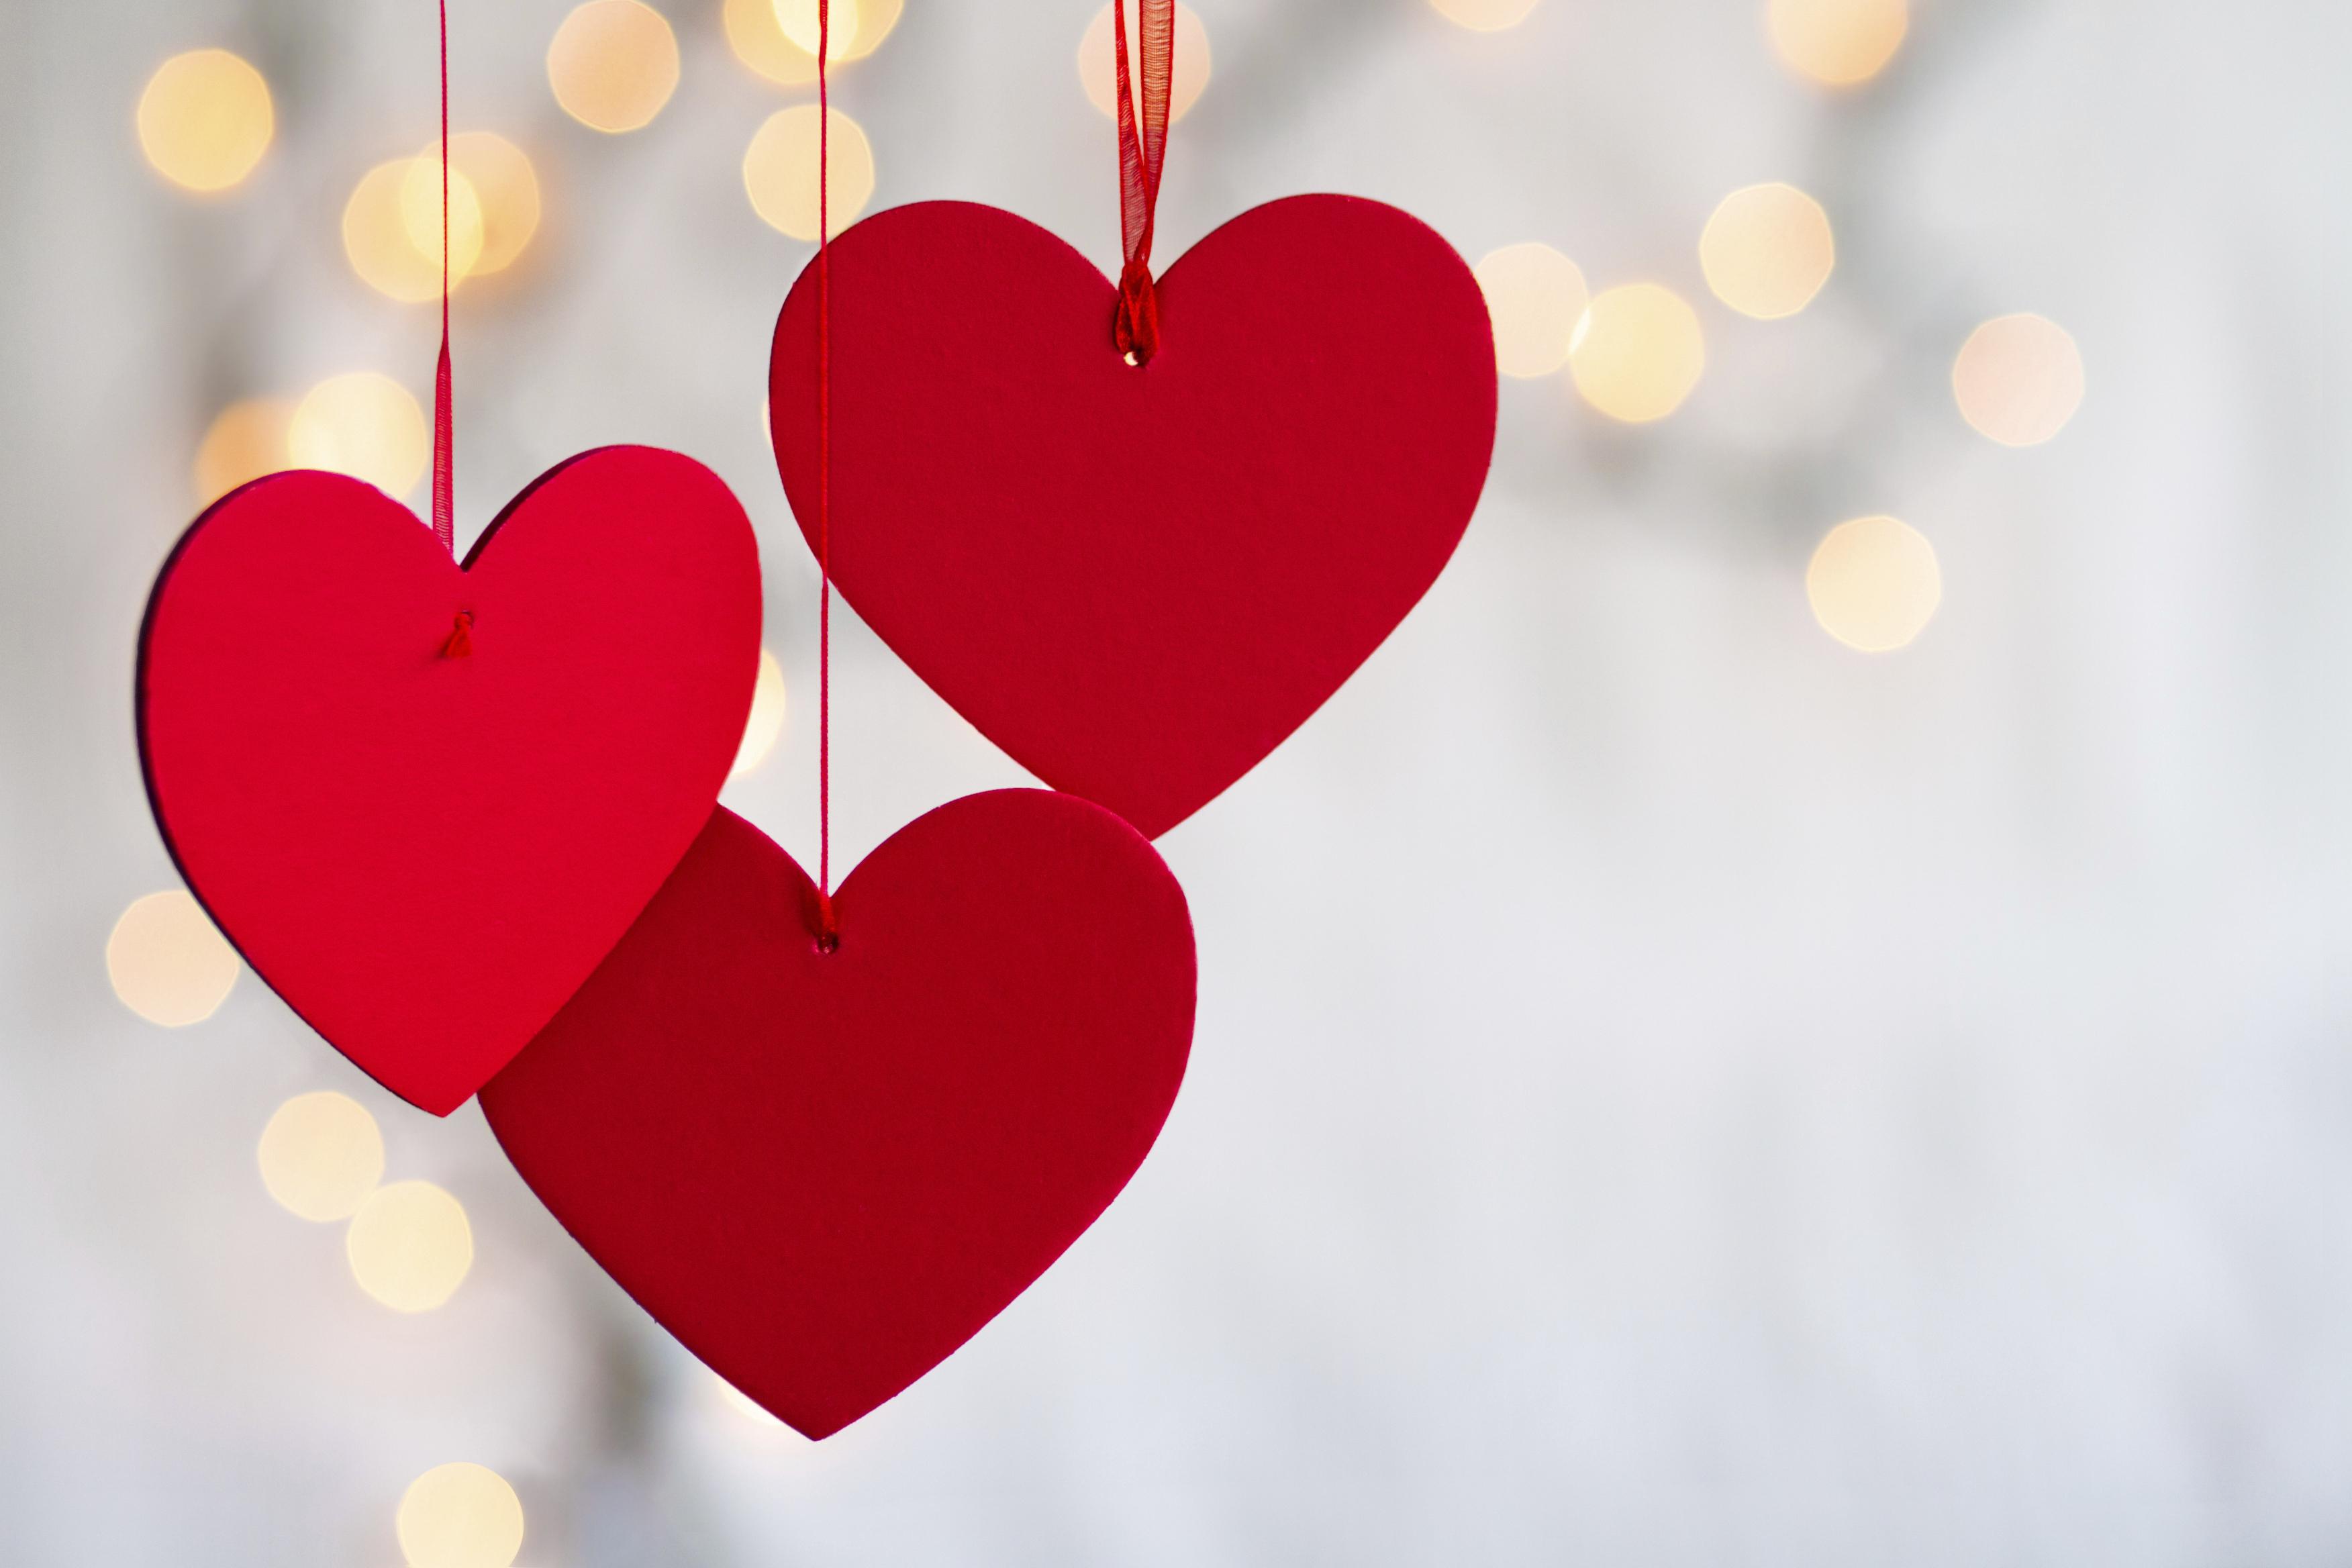 Free Download Valentines Day Desktop Backgrounds